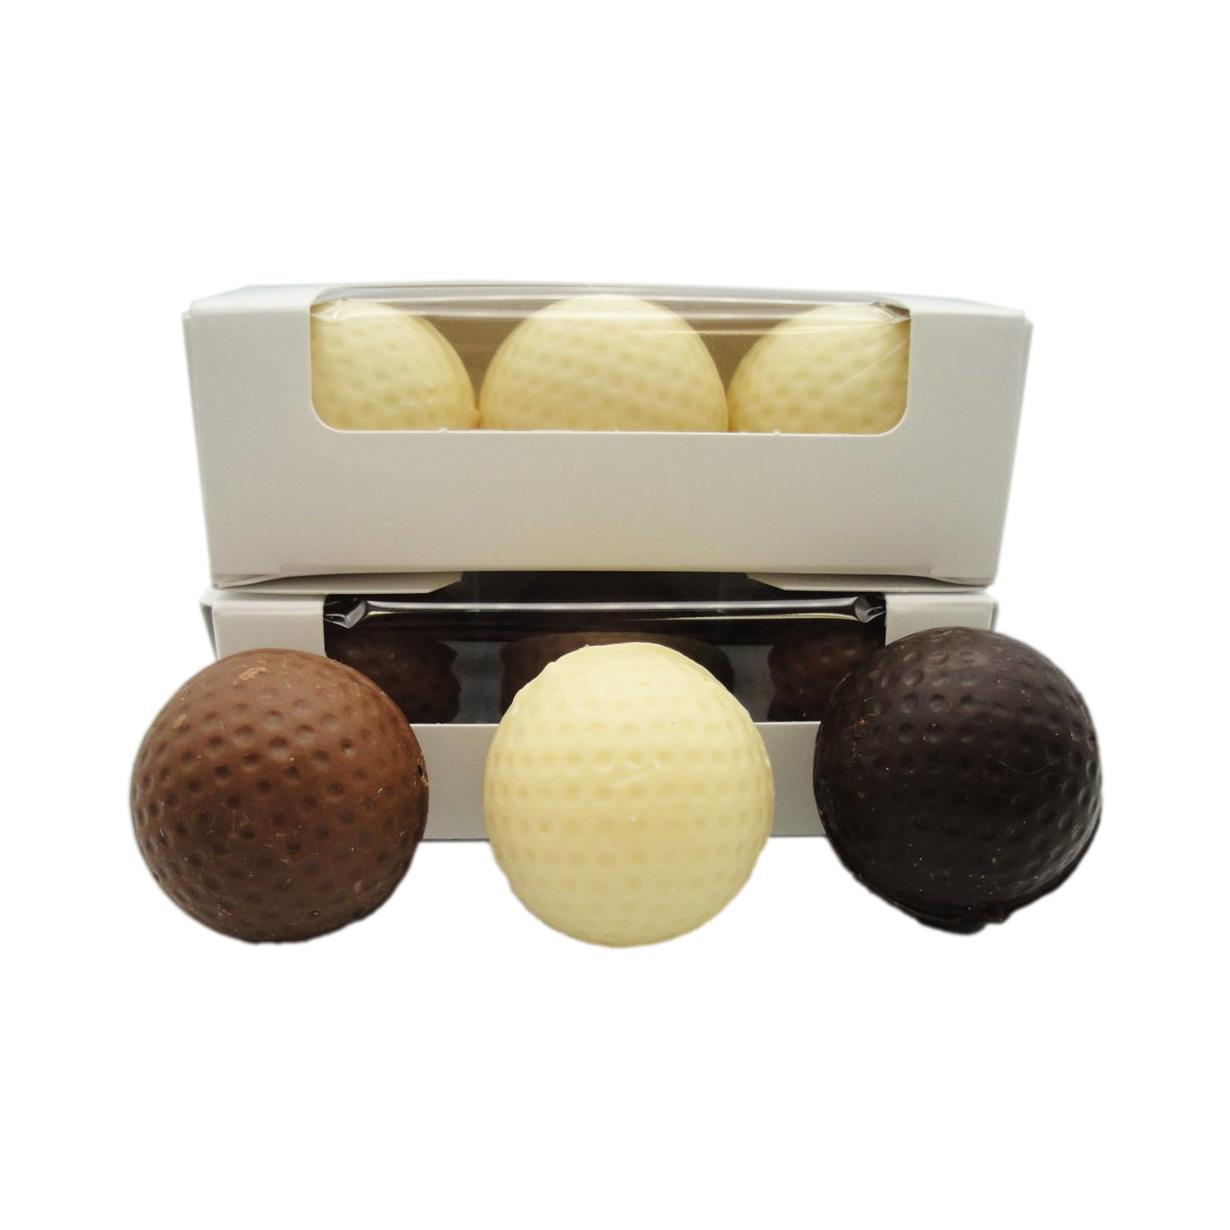 sleeve of chocolate golf balls